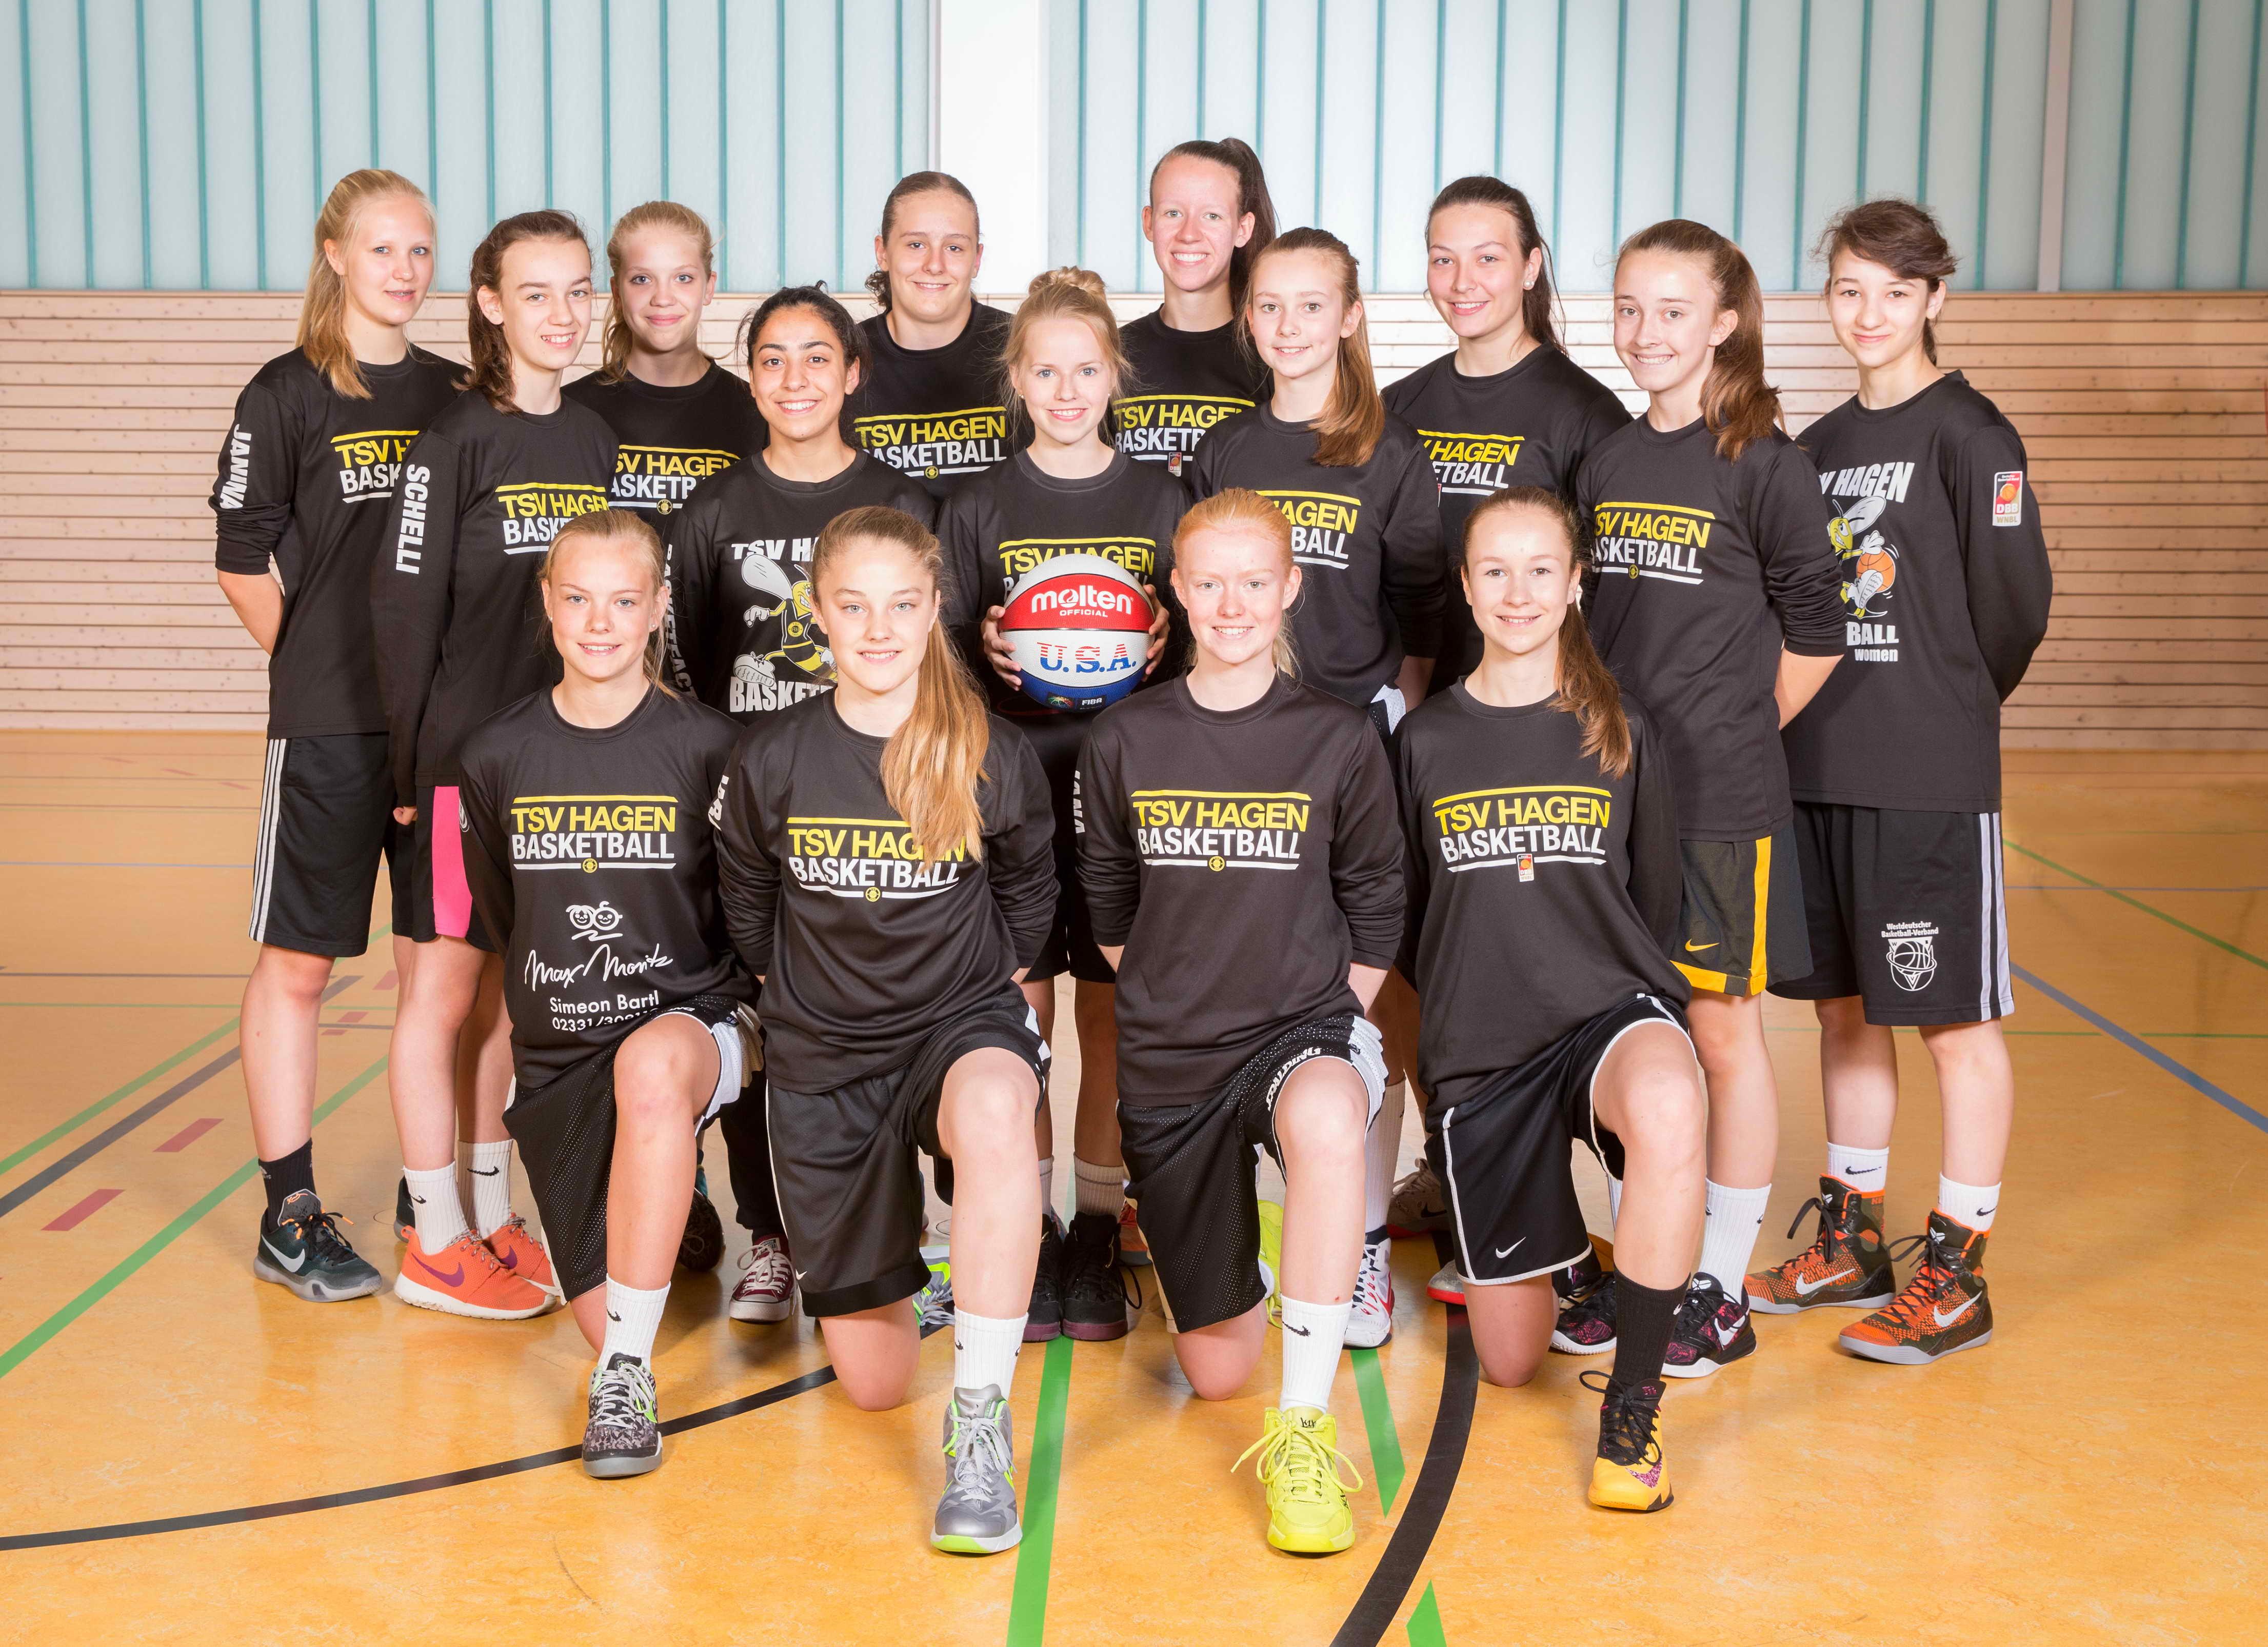 TSV Hagen Teamfoto U17/1  WNBL-Mannschaft